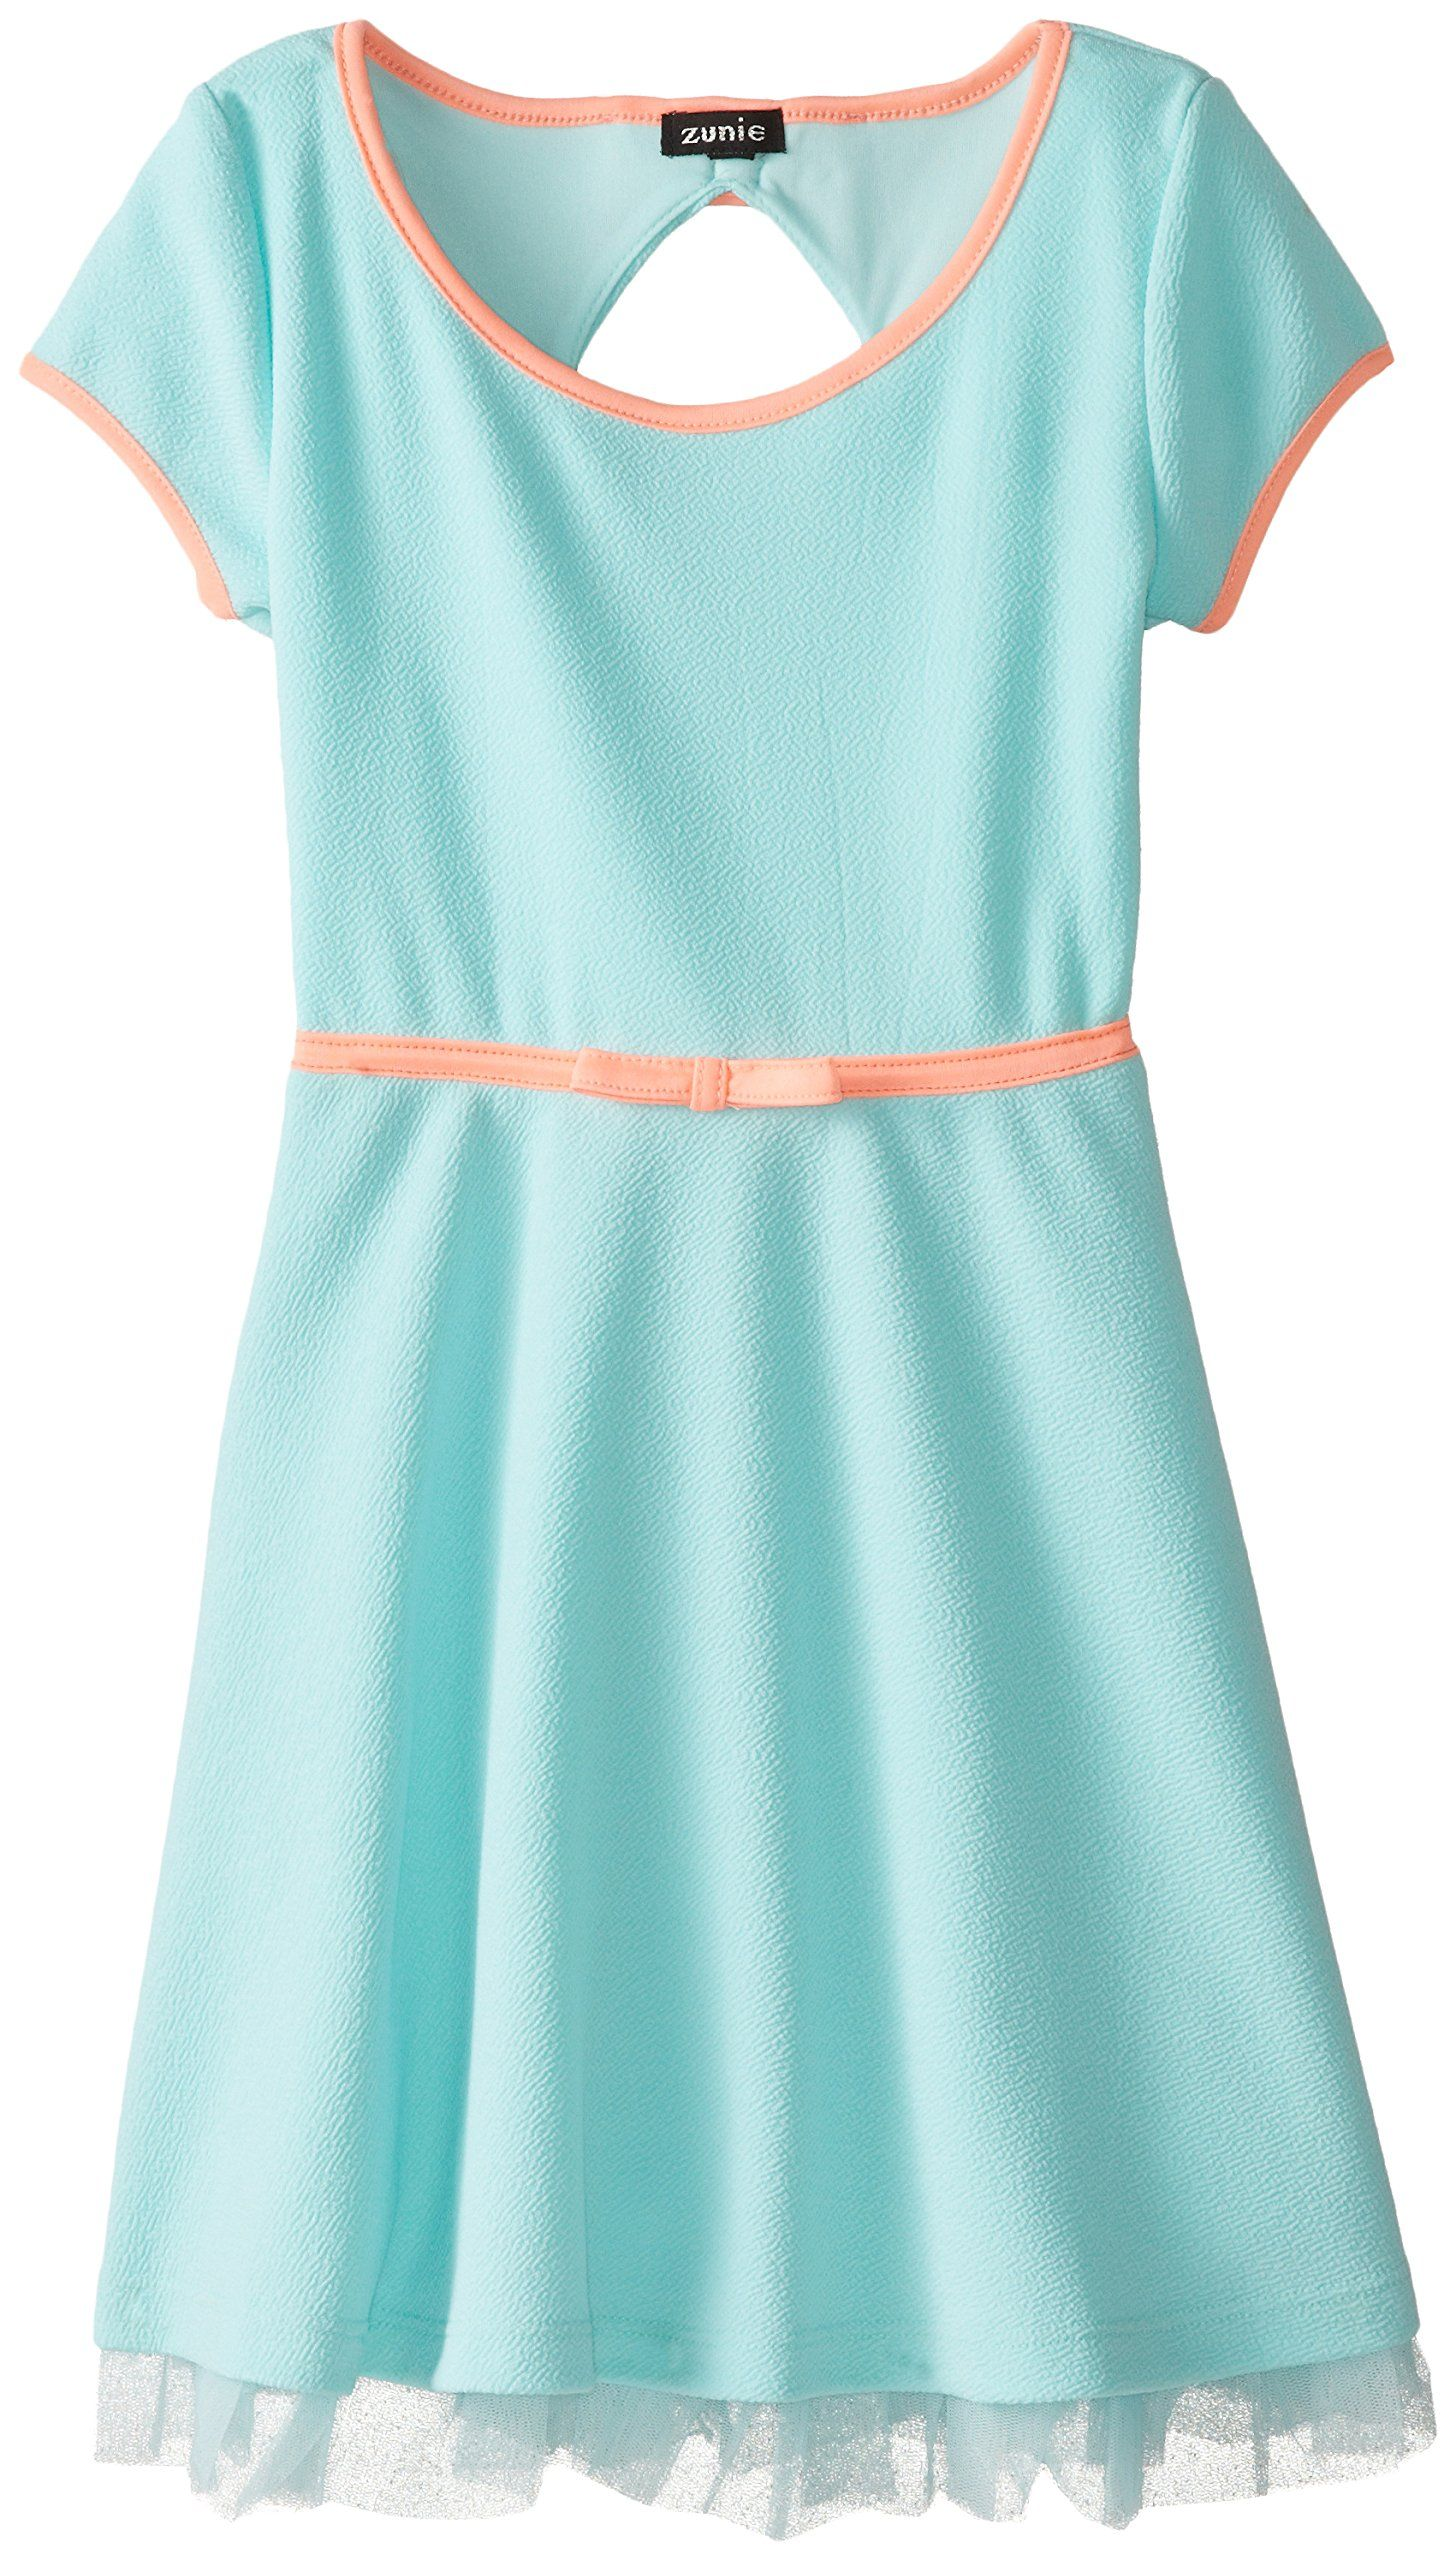 96c03824776c Zunie Big Girls' Texture Knit Skater Dress, Aqua, 8 | Style ...